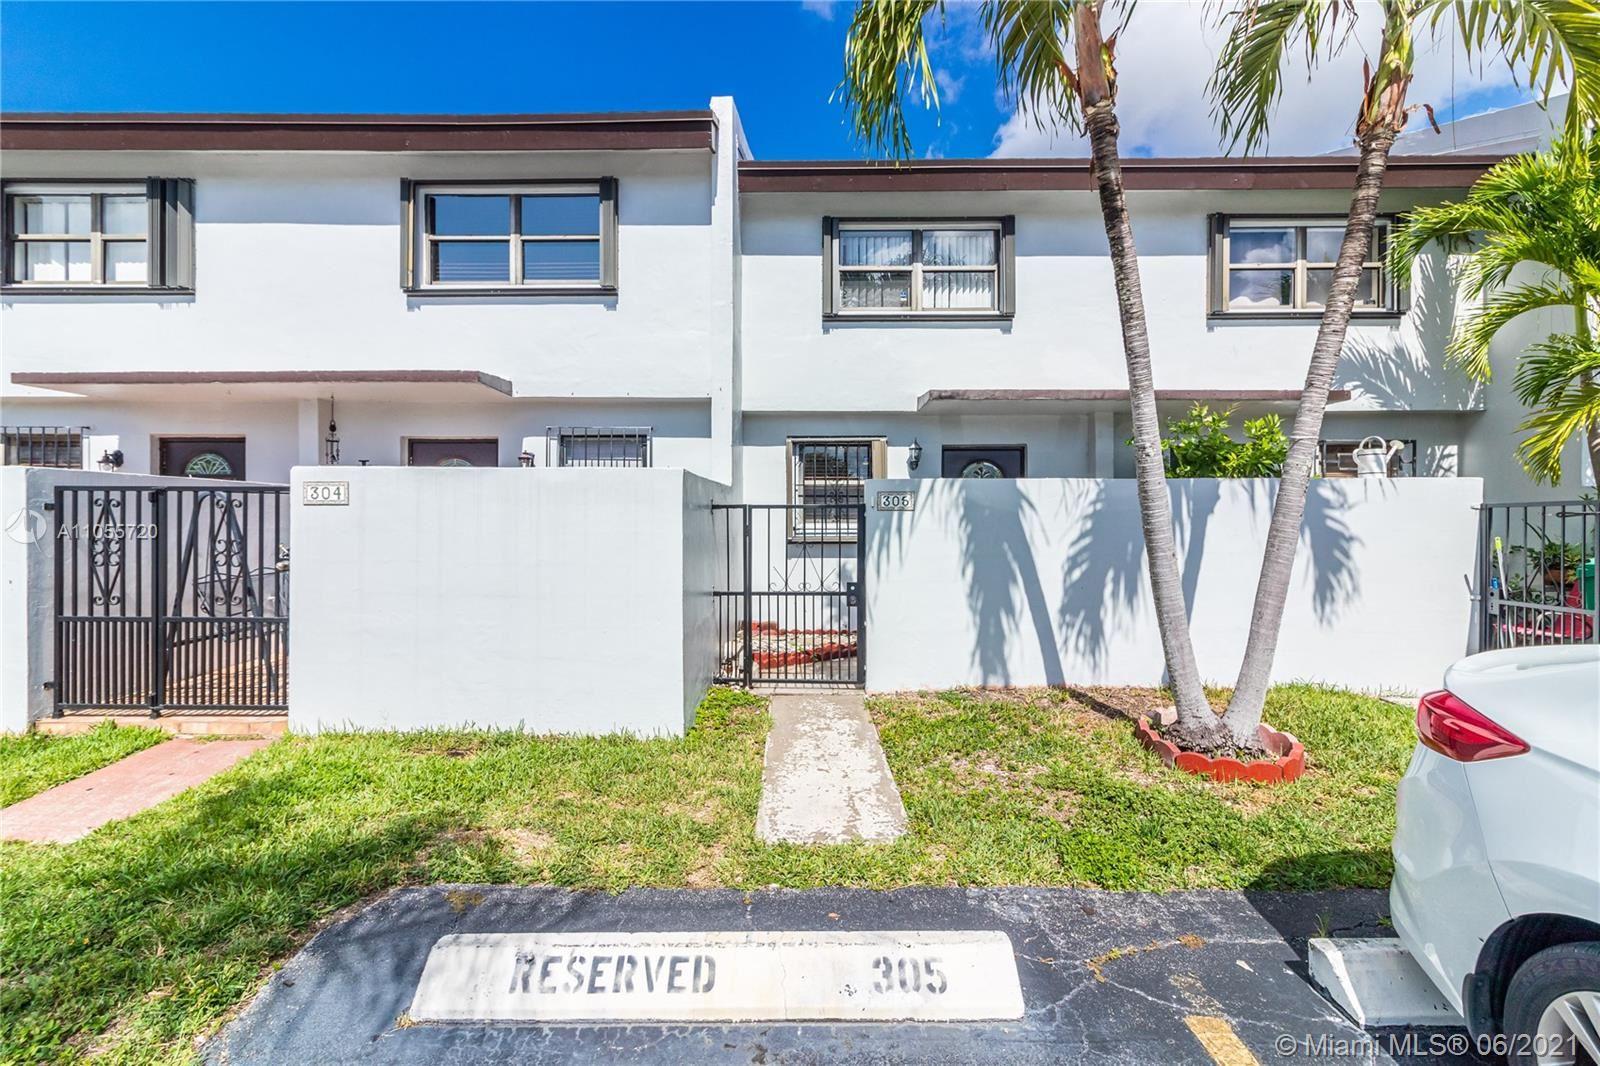 8020 SW 152nd Ave #305, Miami, FL 33193 - #: A11055720